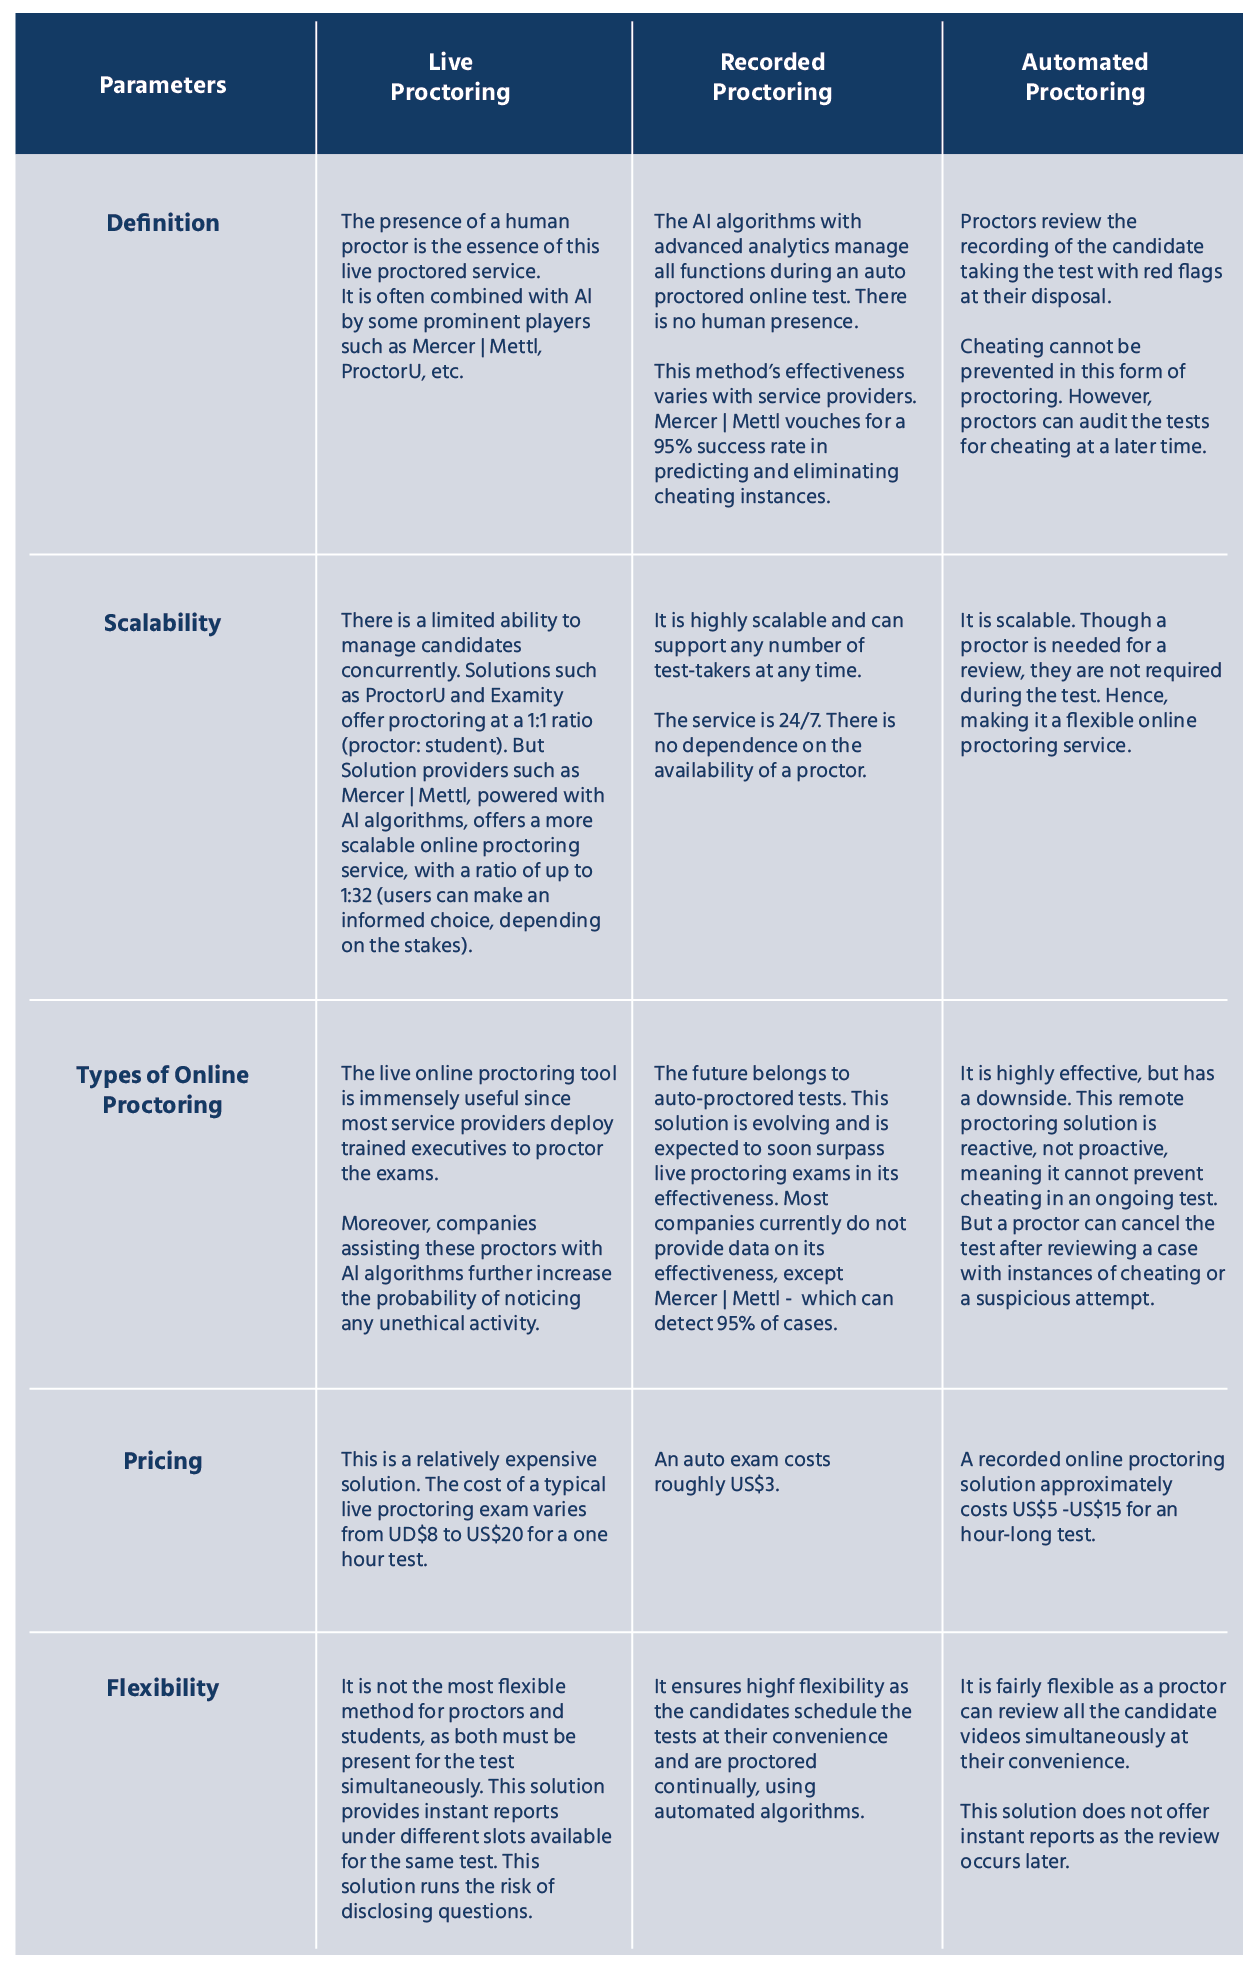 types of online proctoring